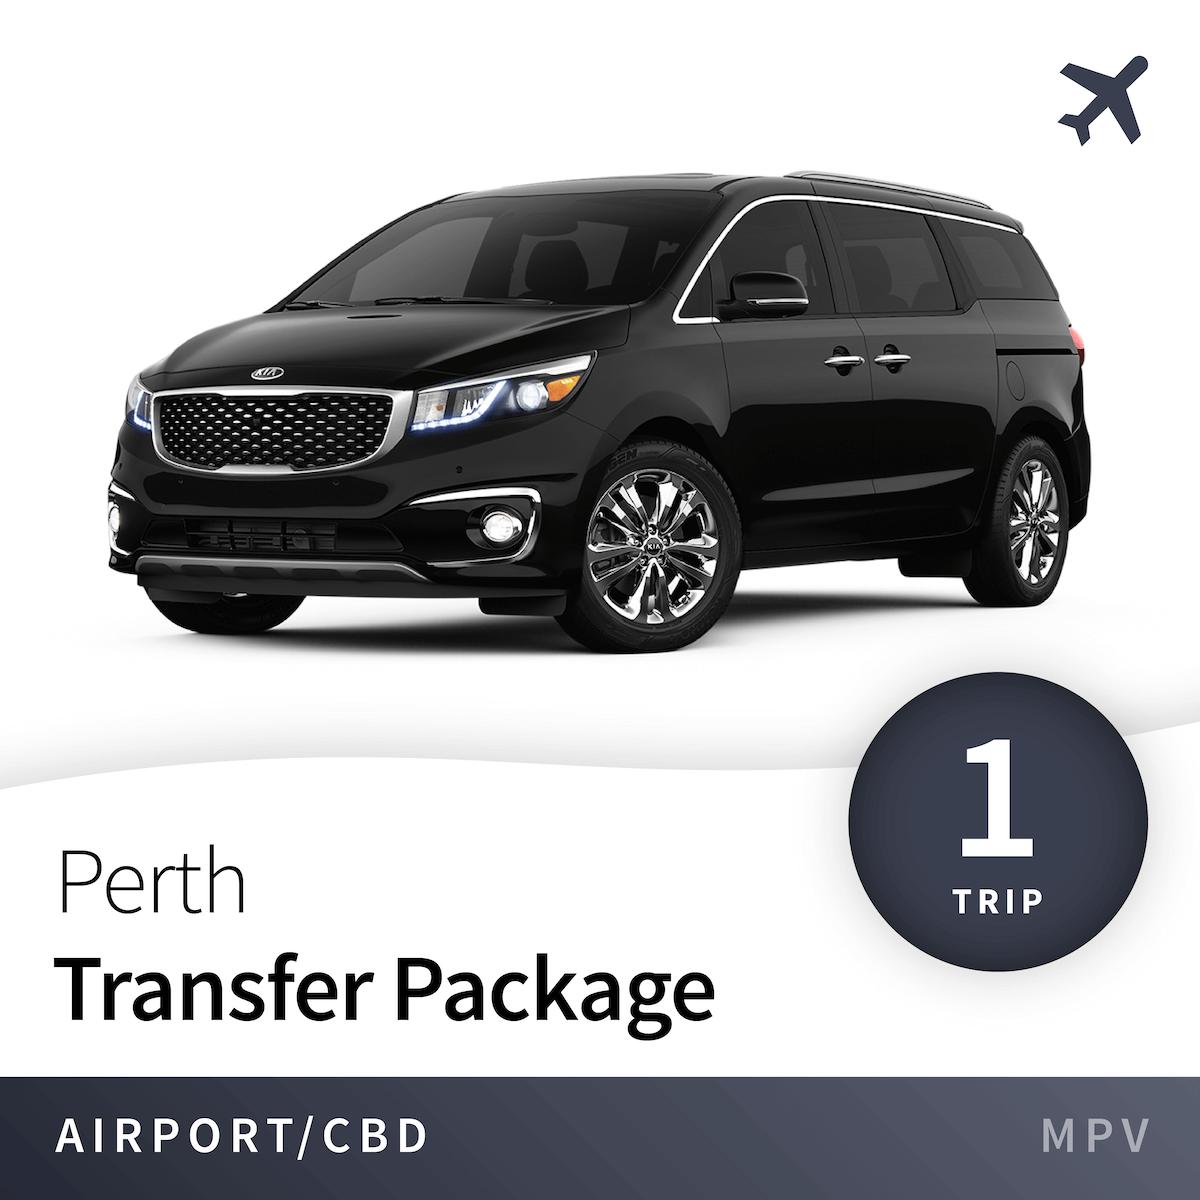 Perth Airport Transfer Package - MPV (1 Trip) 1